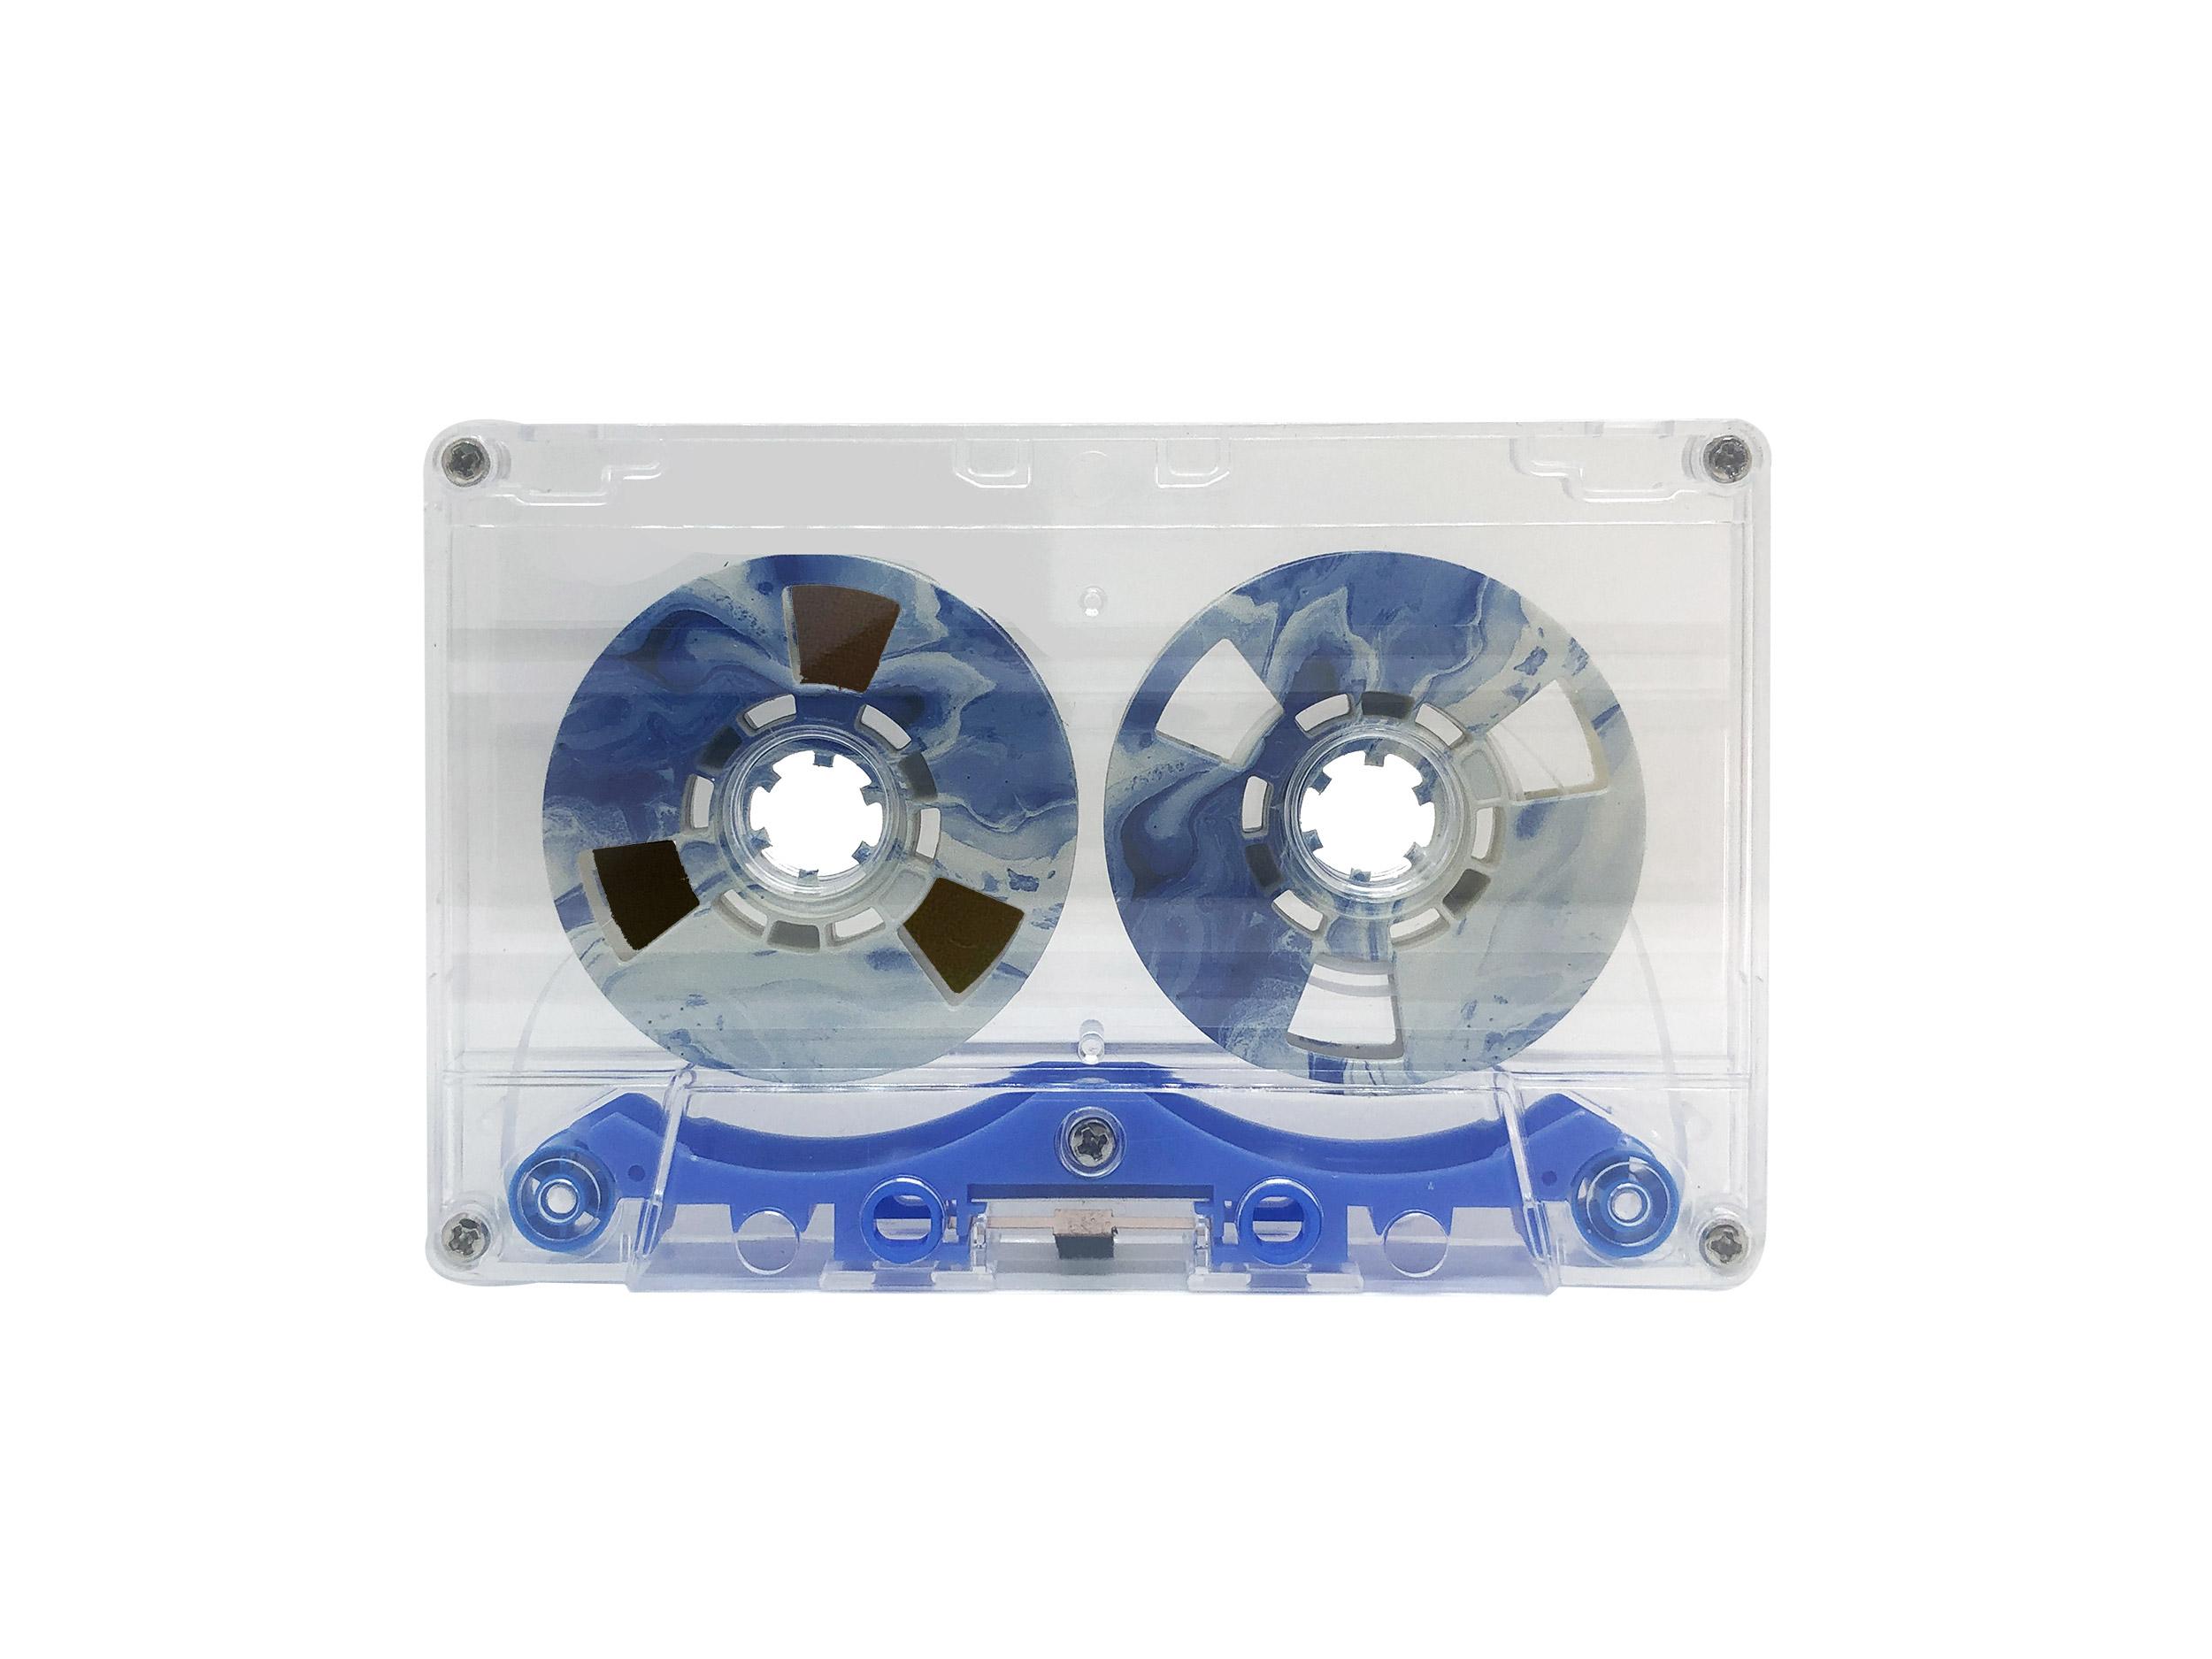 REELTOREEL-MARBLE-MUSICBOX